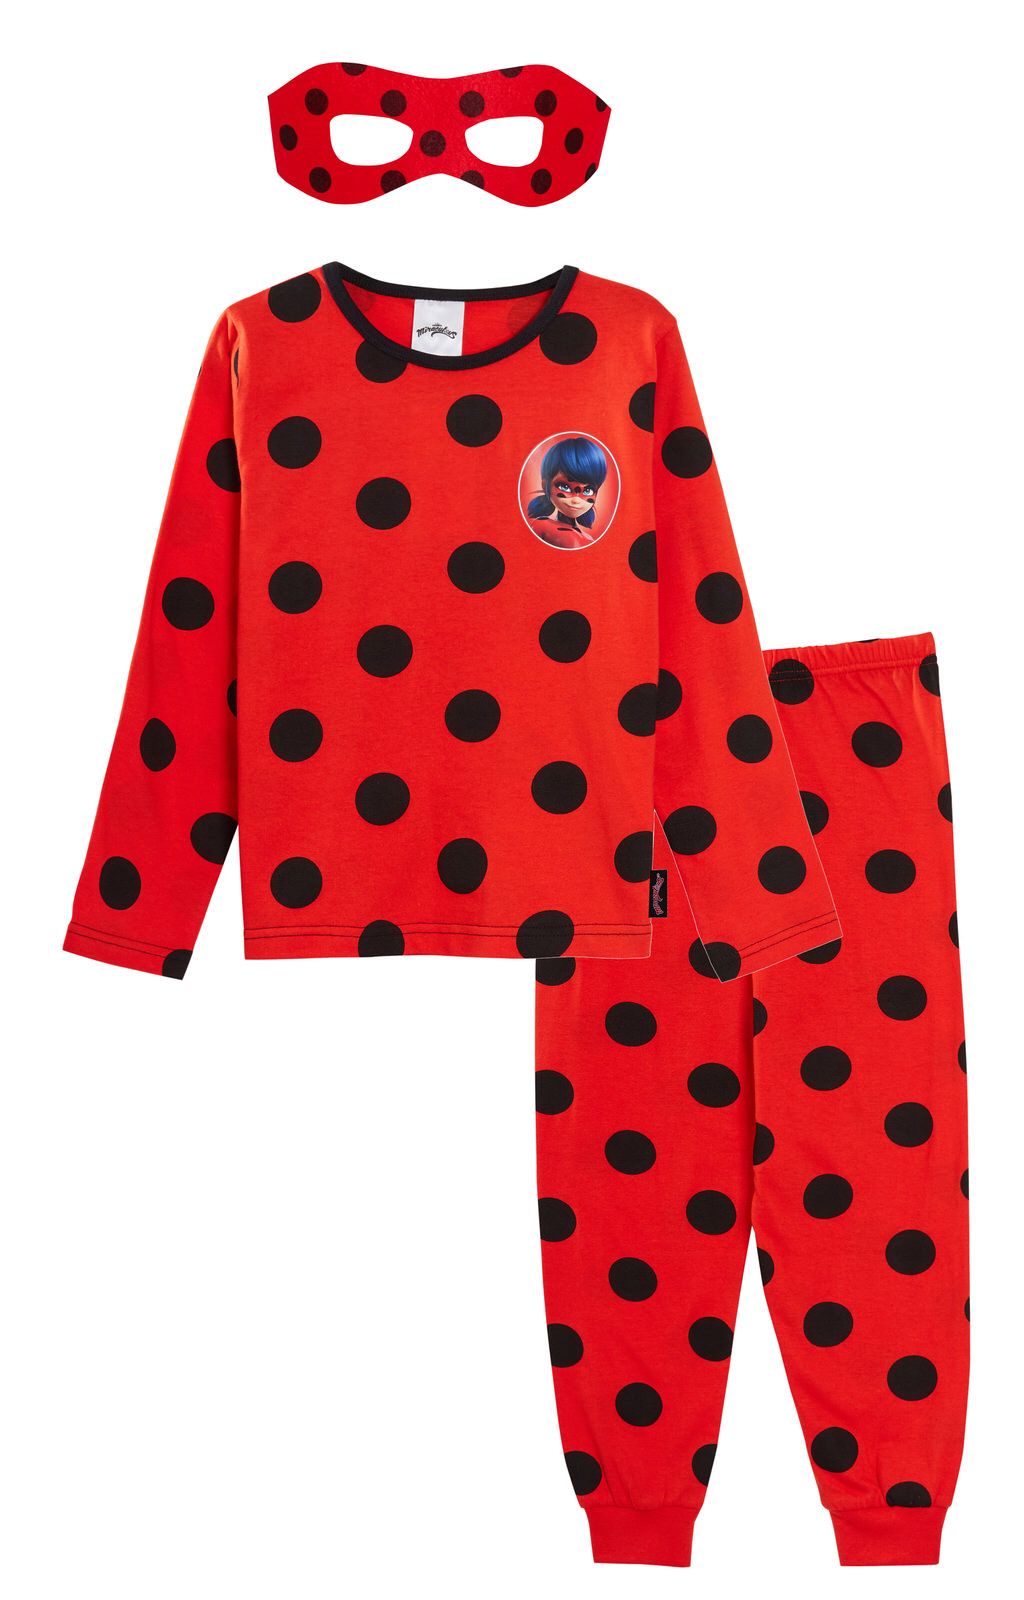 Pyjamas Character Pjs Boys Girls Size Kids Fancy Dress Up Play Party Costumes